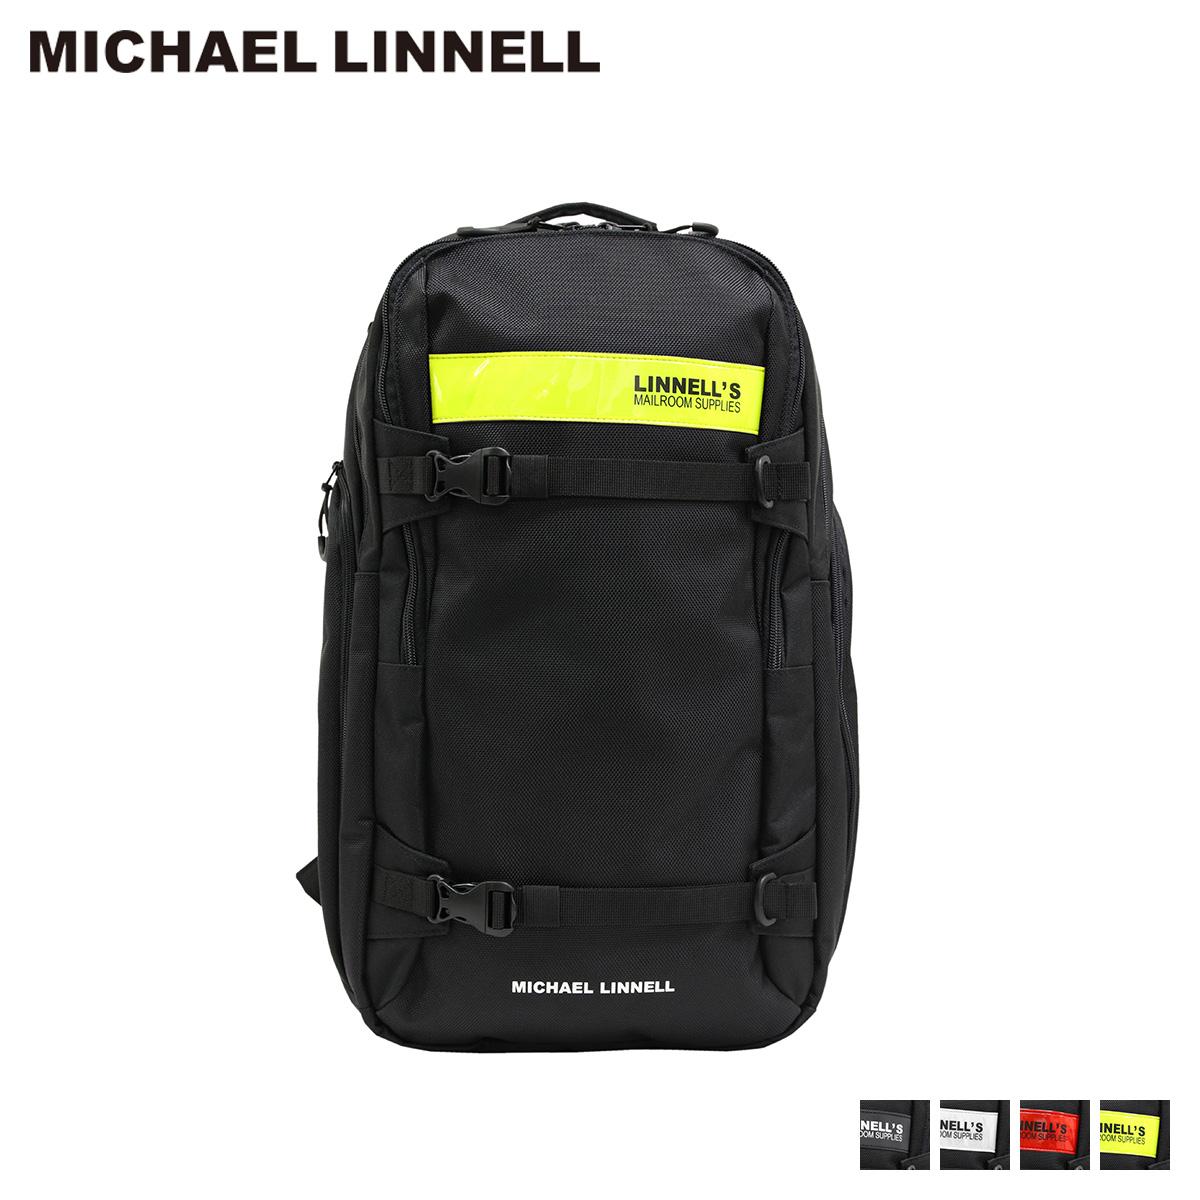 MICHAEL LINNELL 2FLAP BACKPACK マイケルリンネル リュック バッグ 29L メンズ レディース バックパック ブラック 黒 ML-030 [10/18 新入荷]